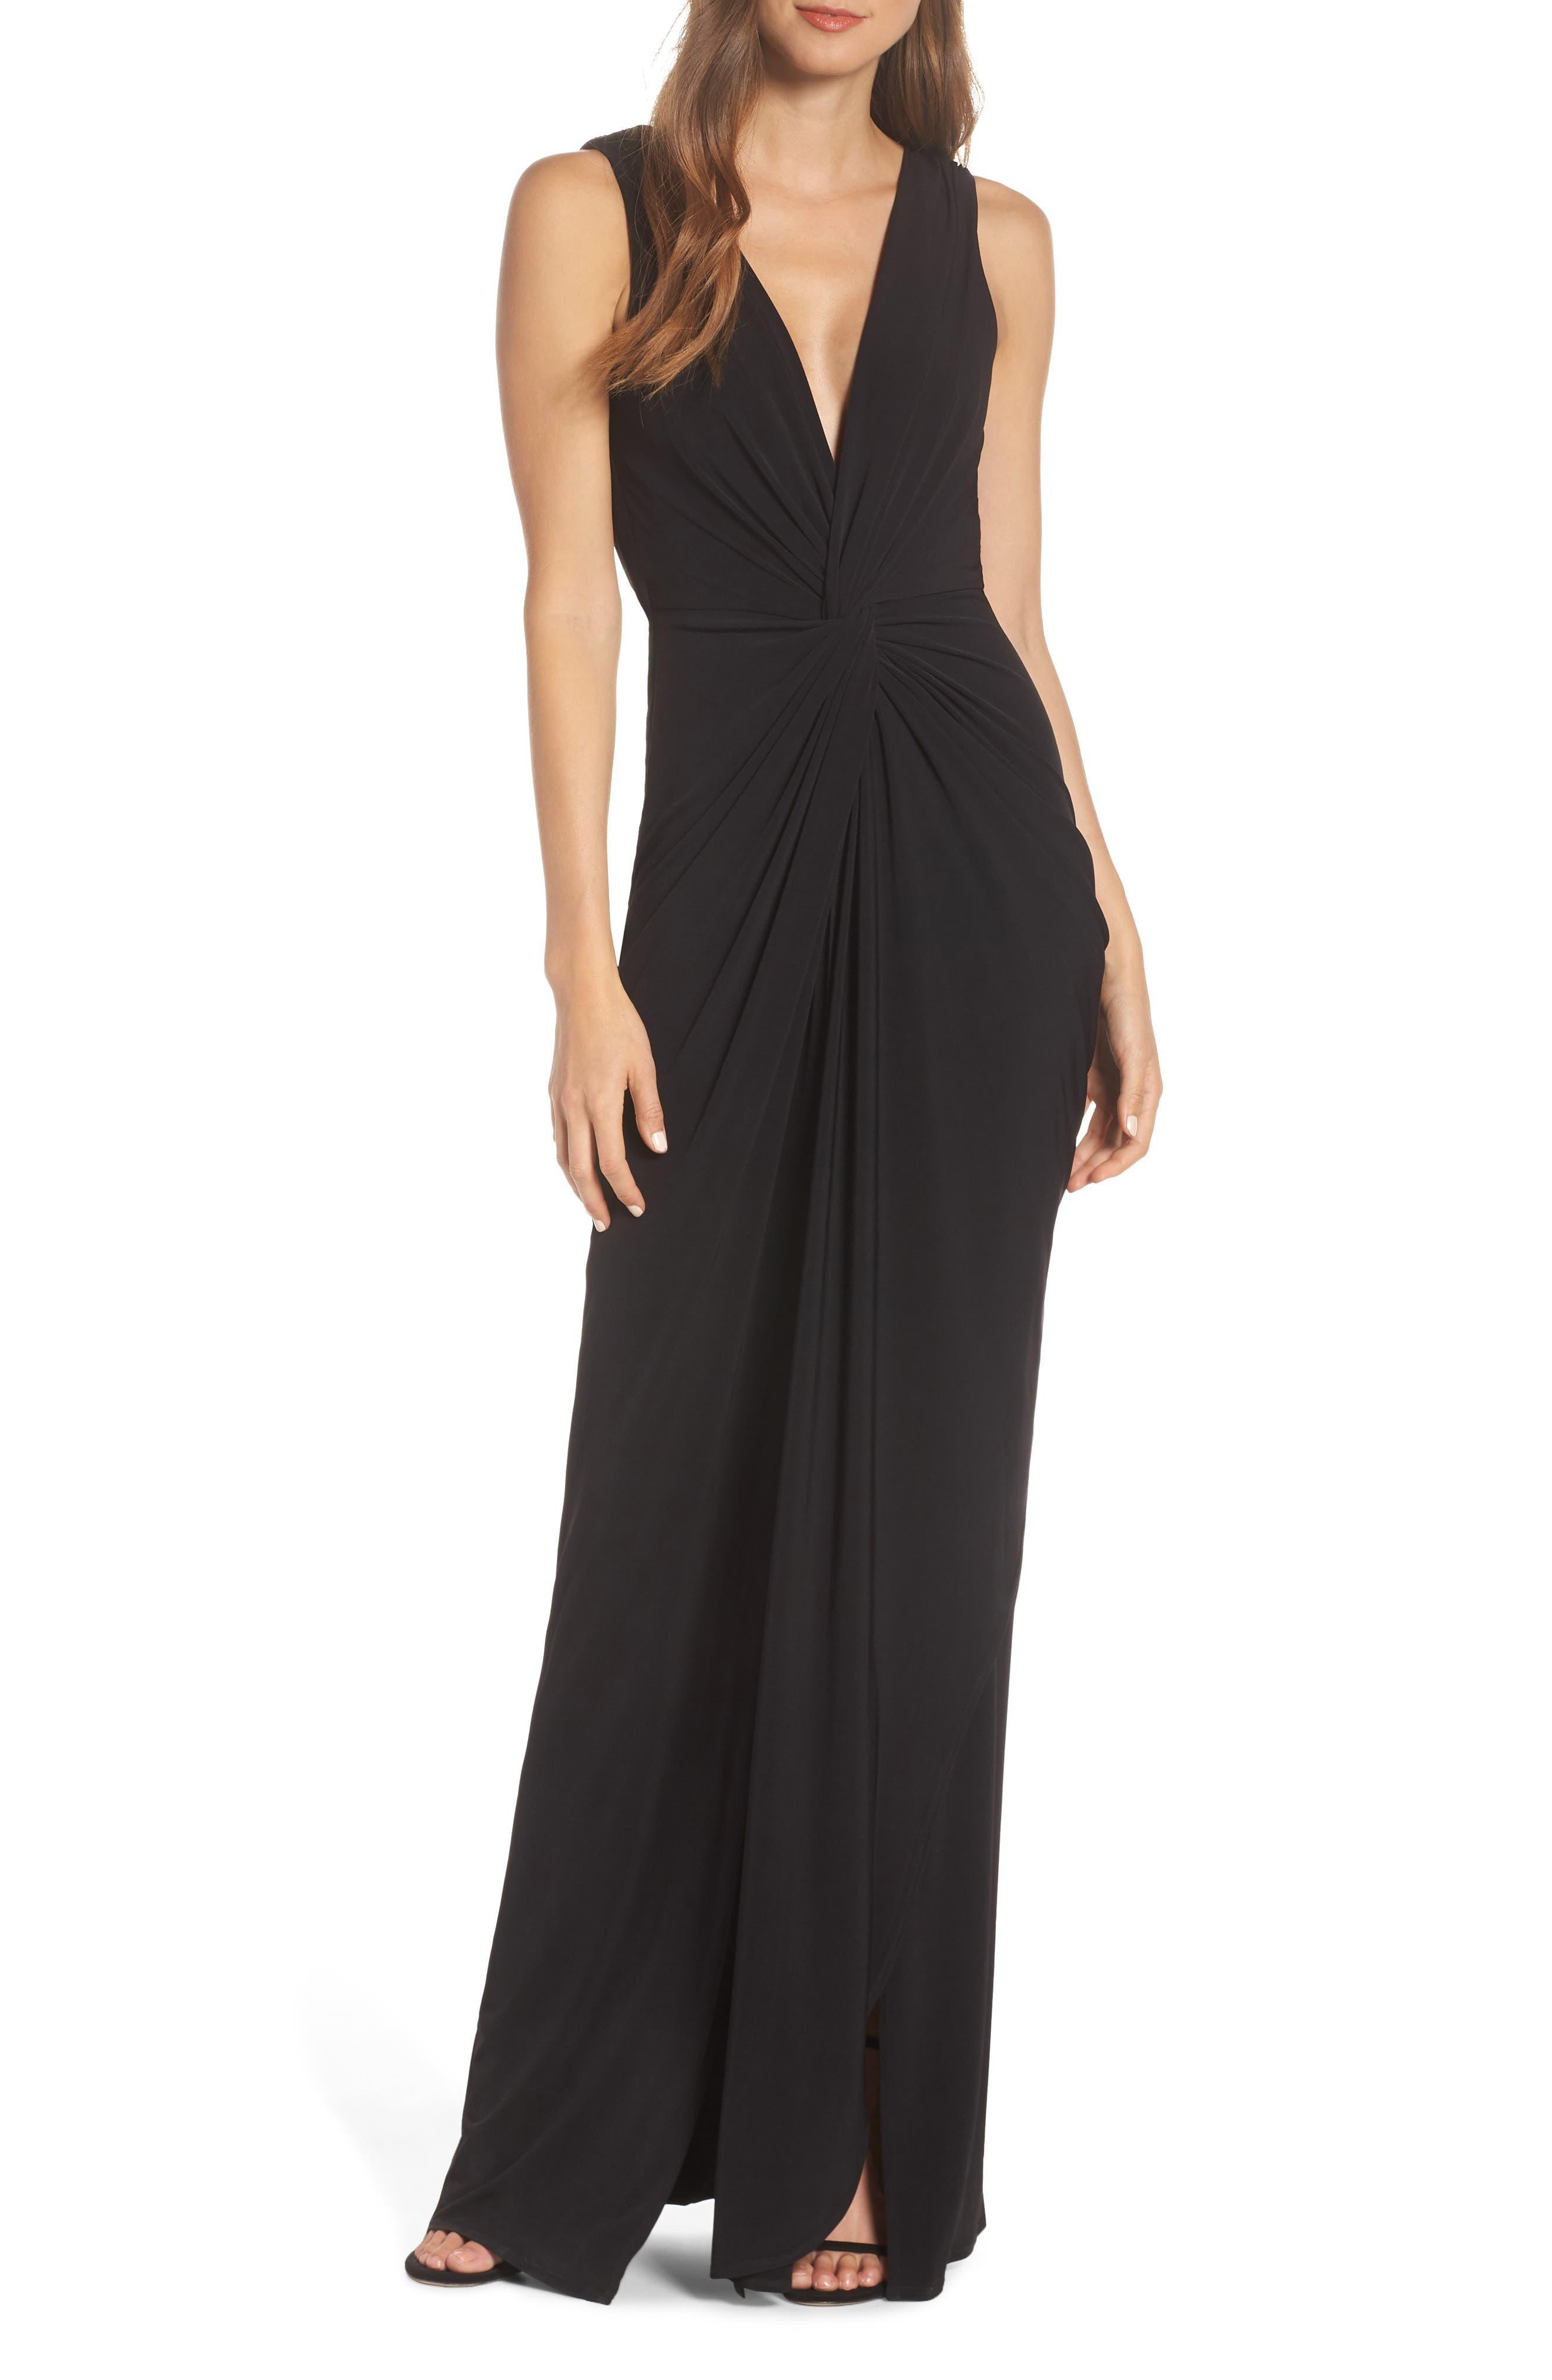 Katie May Leo Twist Front Evening Dress, Black